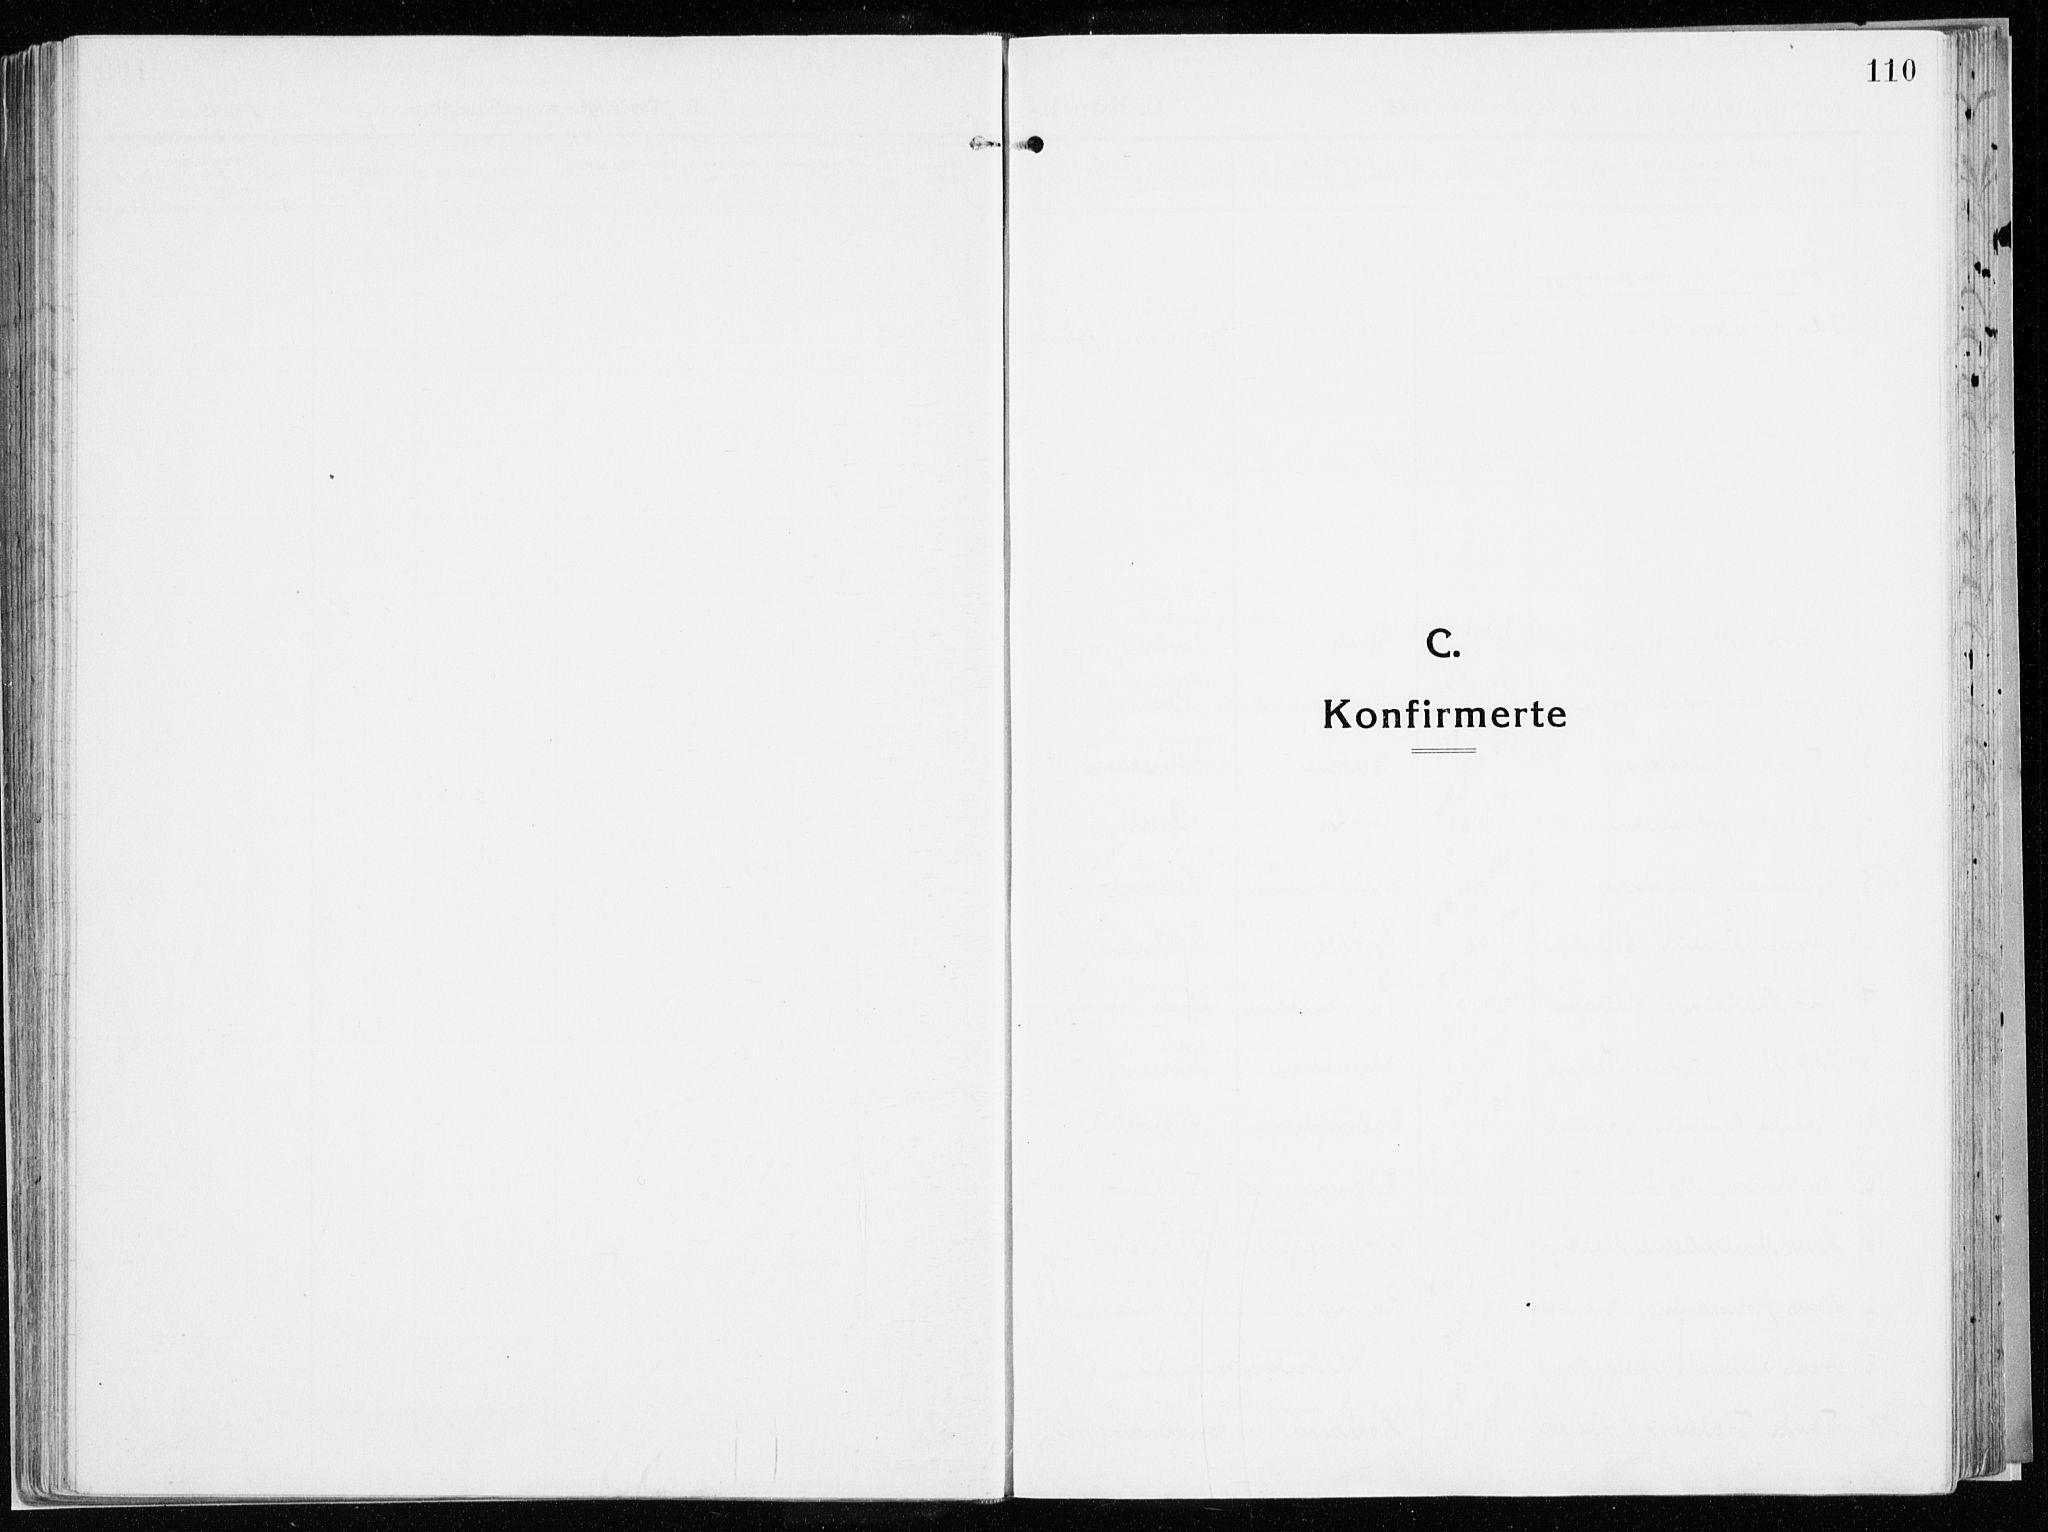 SAH, Vardal prestekontor, H/Ha/Haa/L0017: Ministerialbok nr. 17, 1915-1929, s. 110